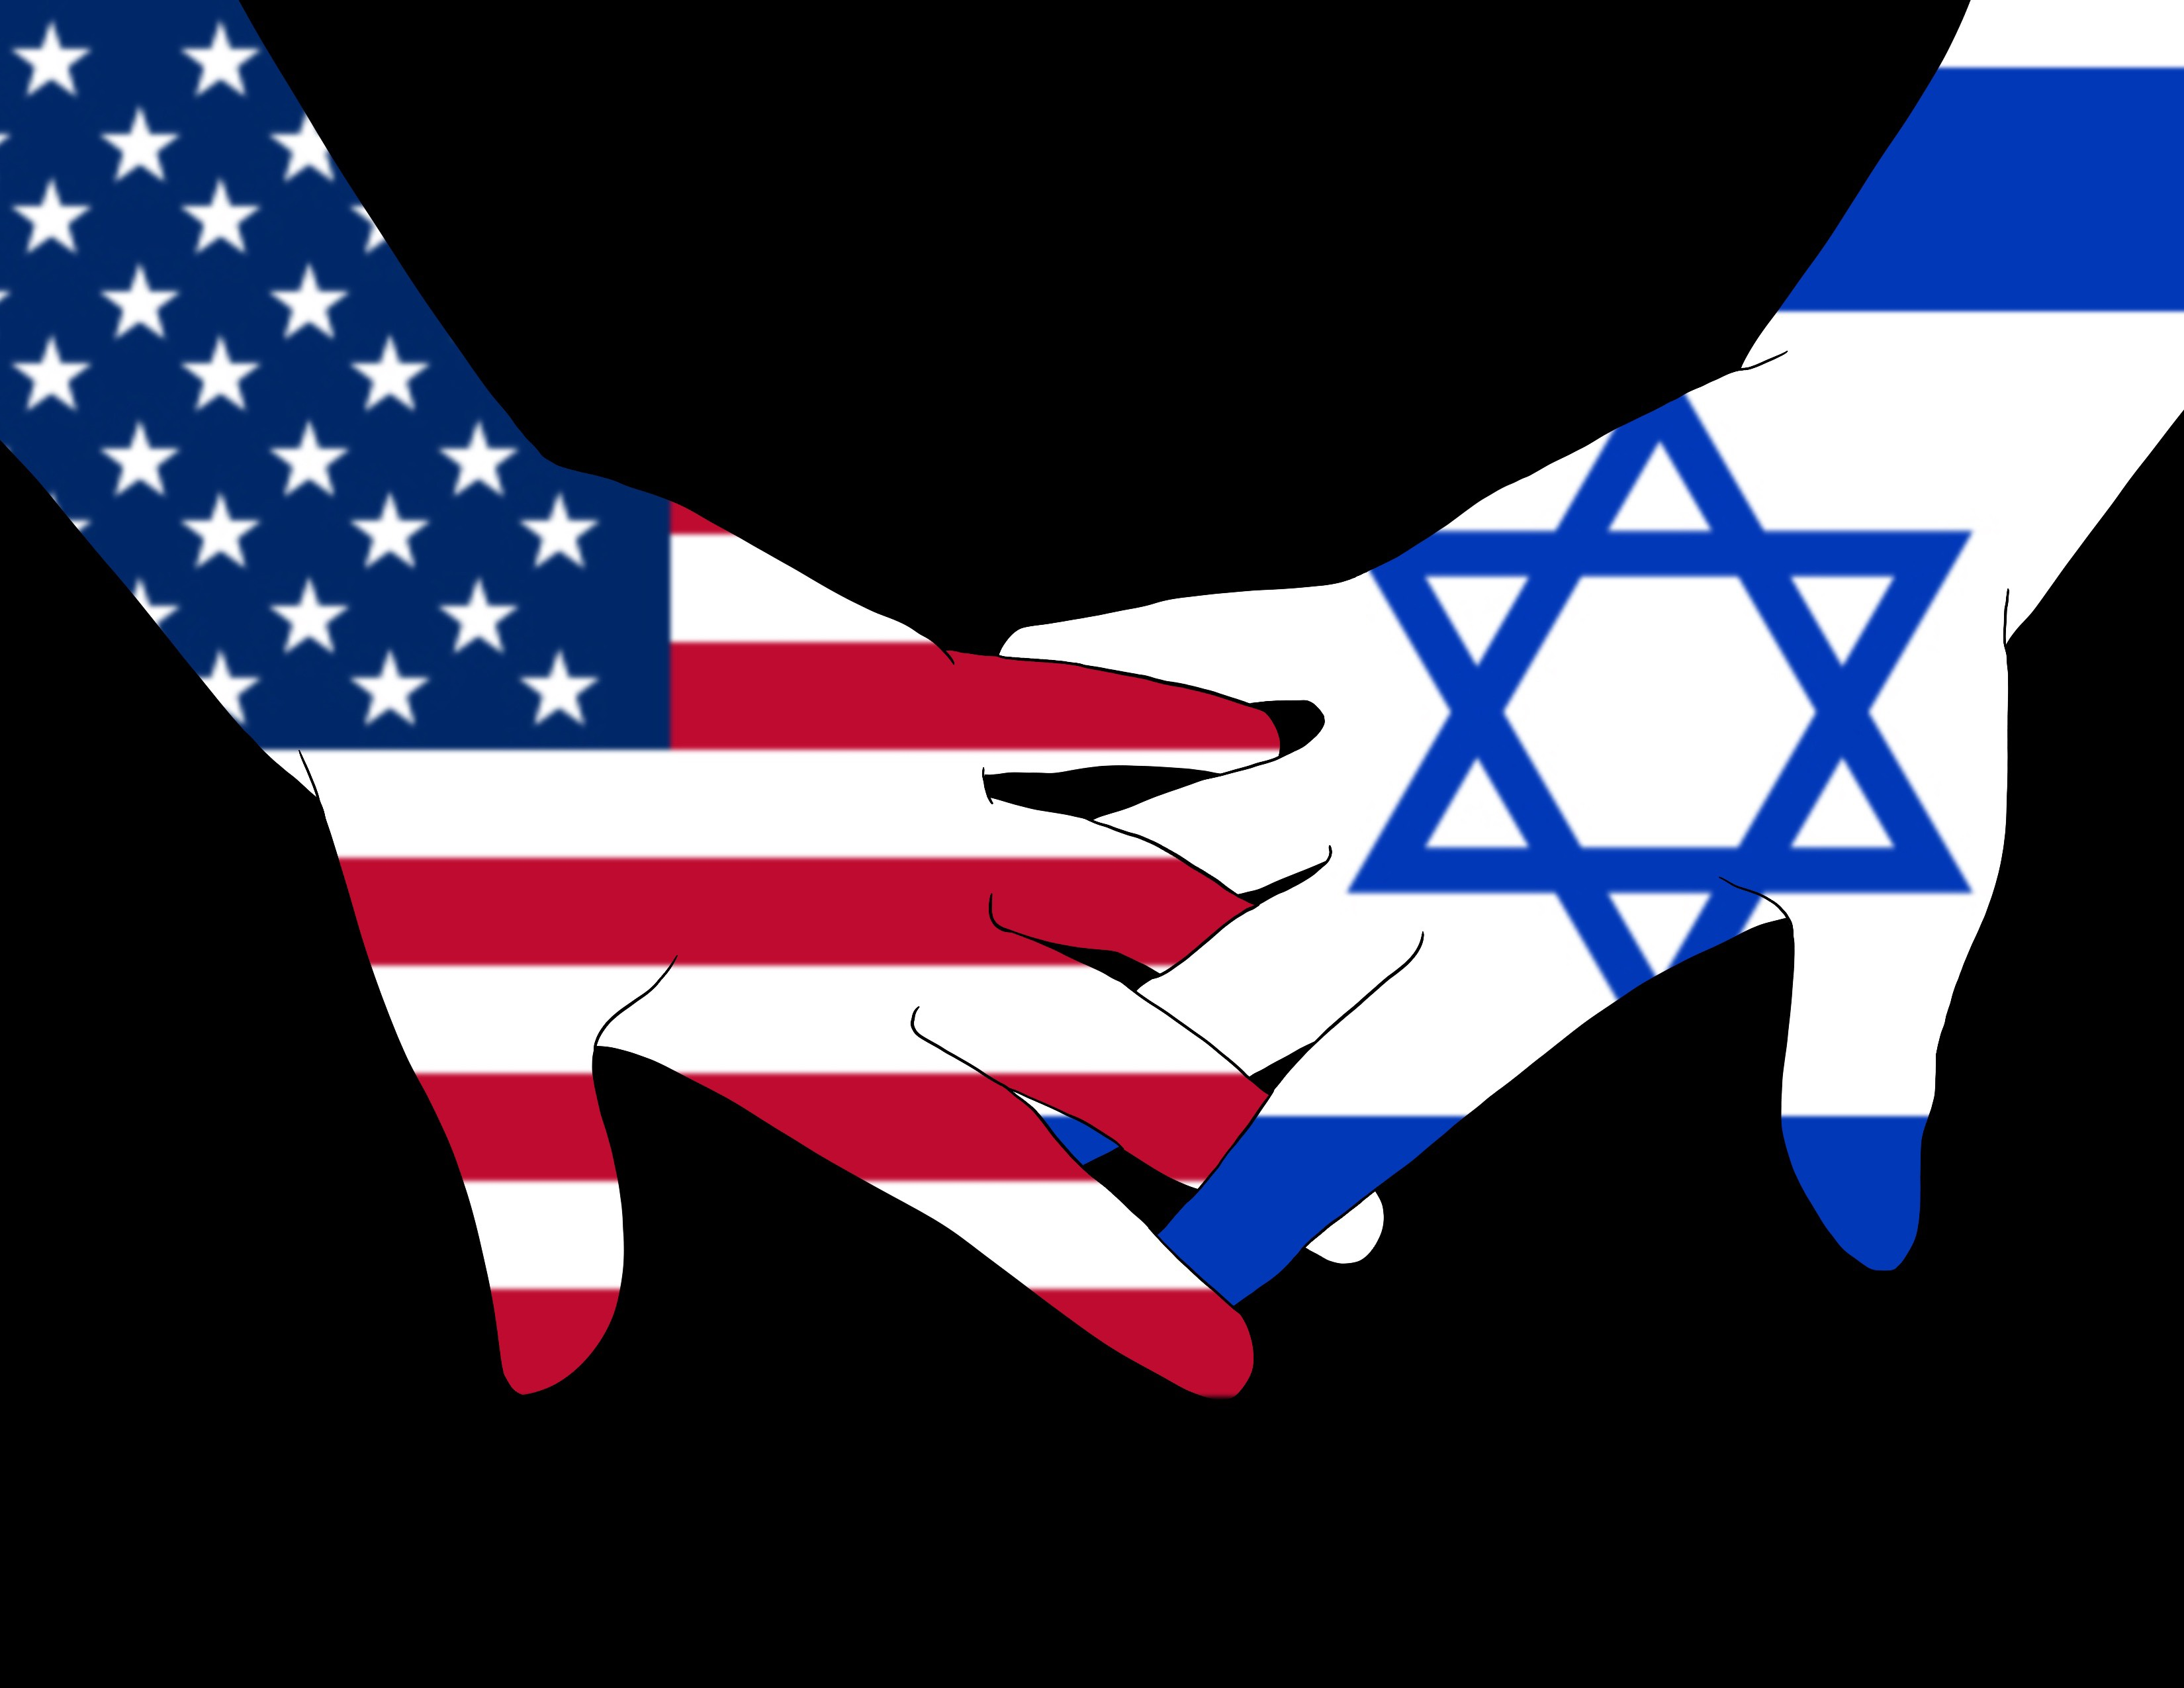 Flag hands